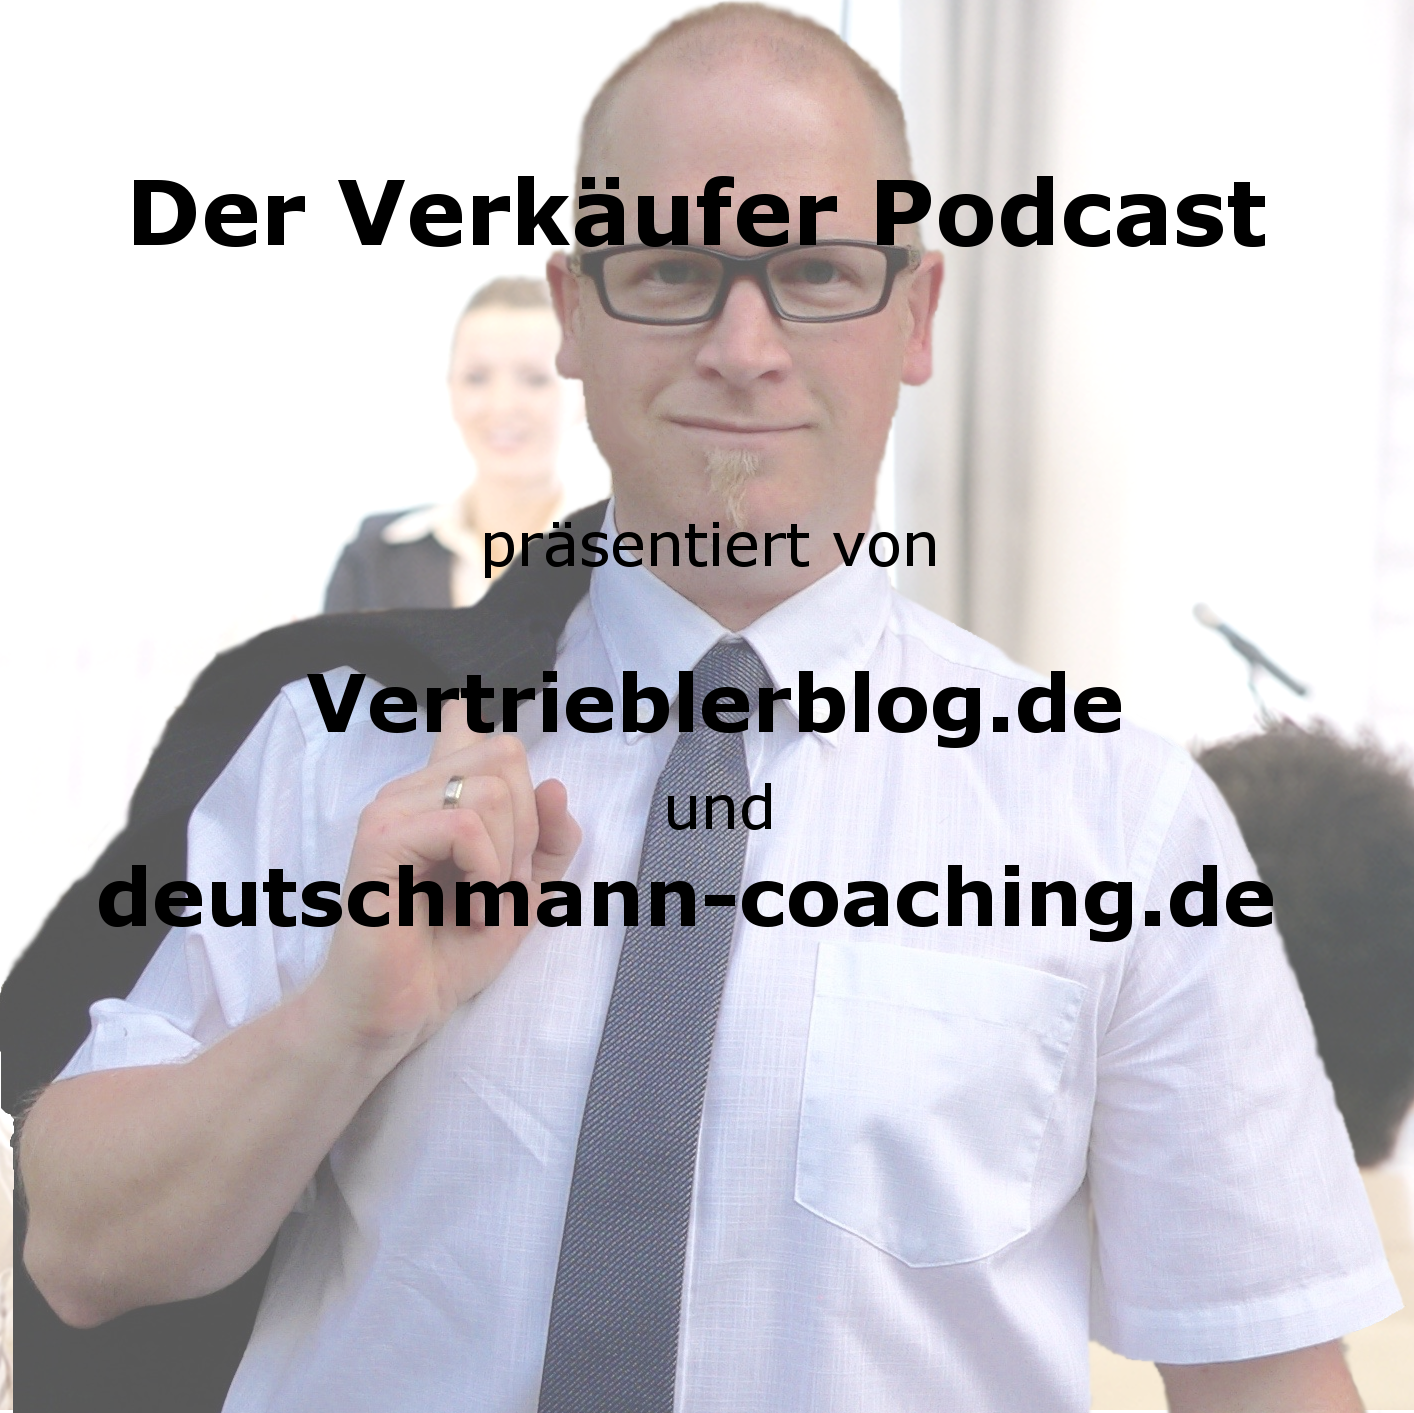 Vertrieblerblog.de